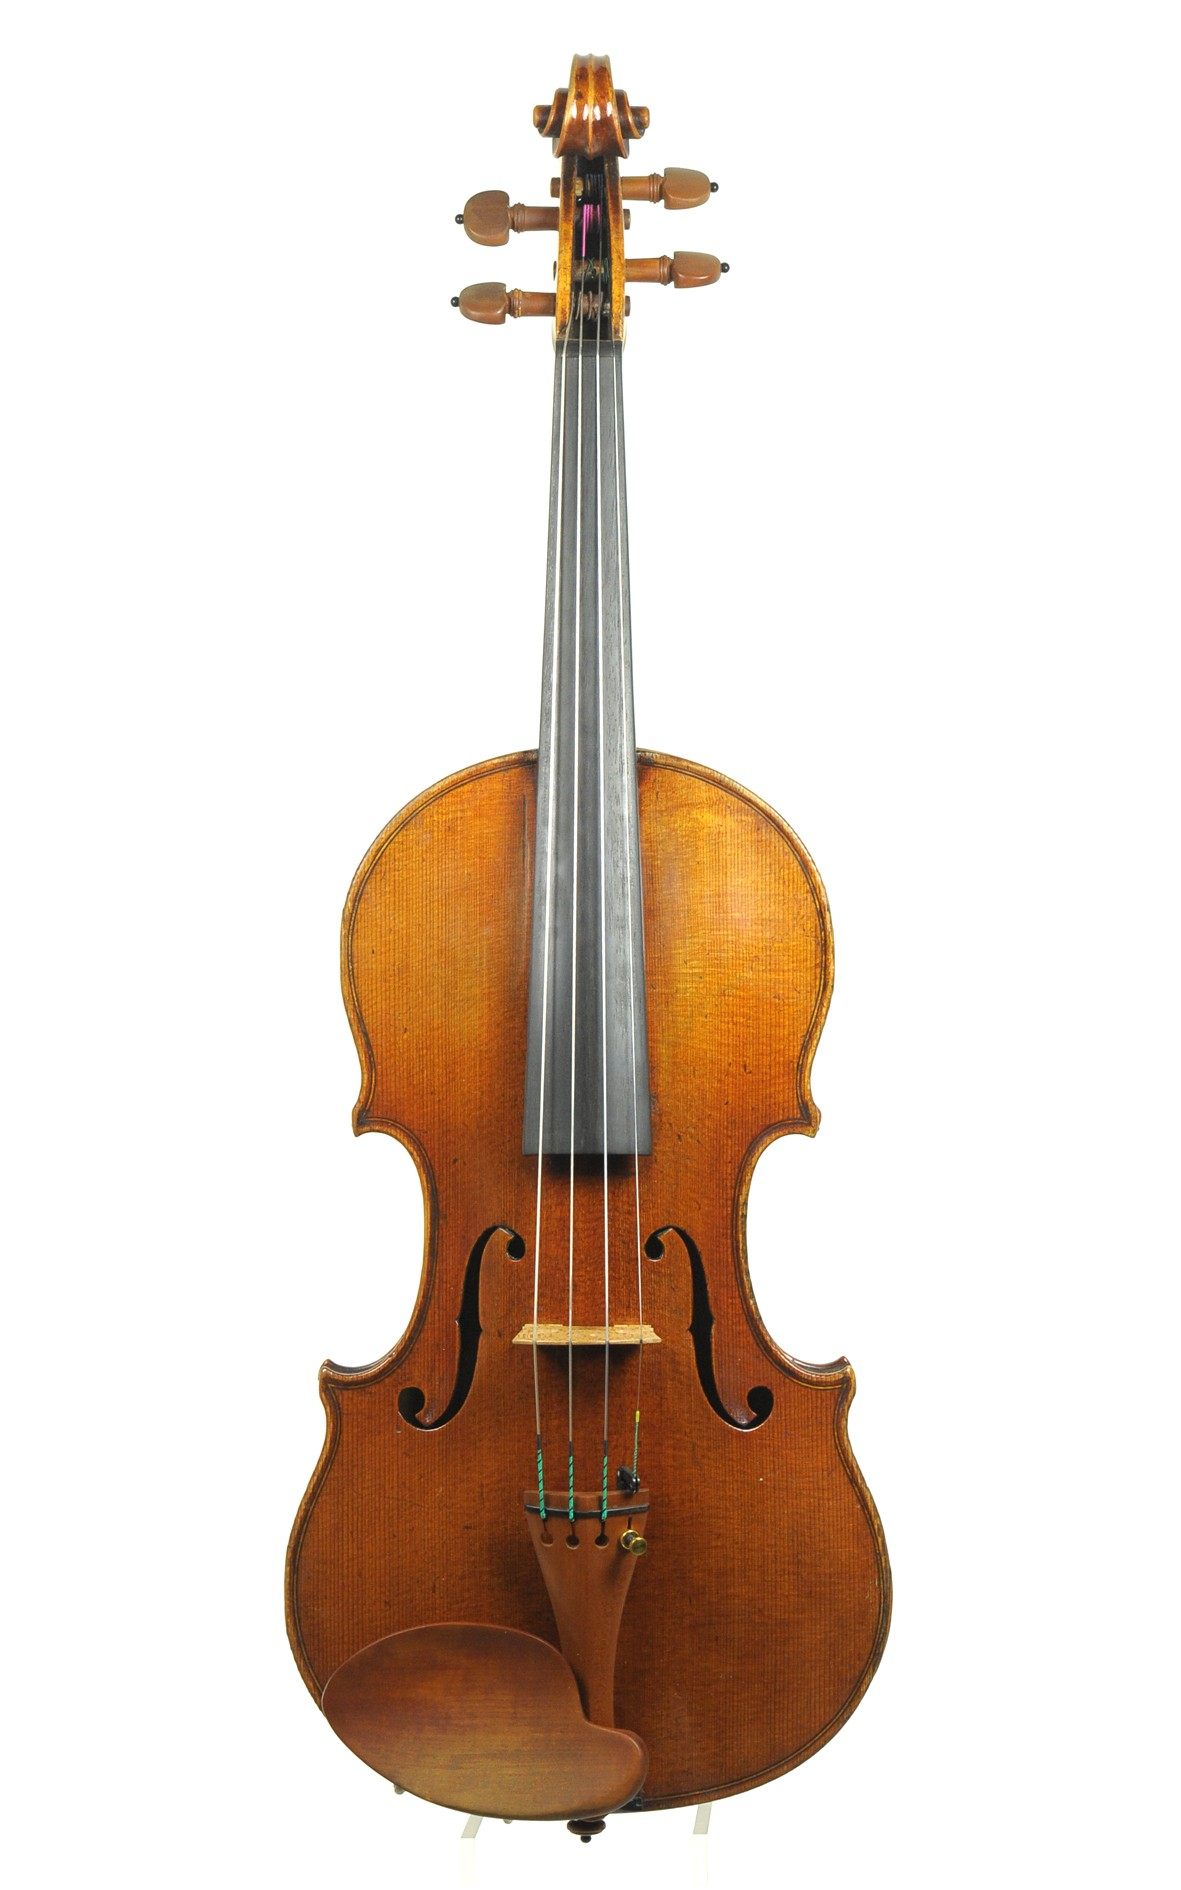 Ernst Heinrich Roth, 1924 master violin, Amati model - top